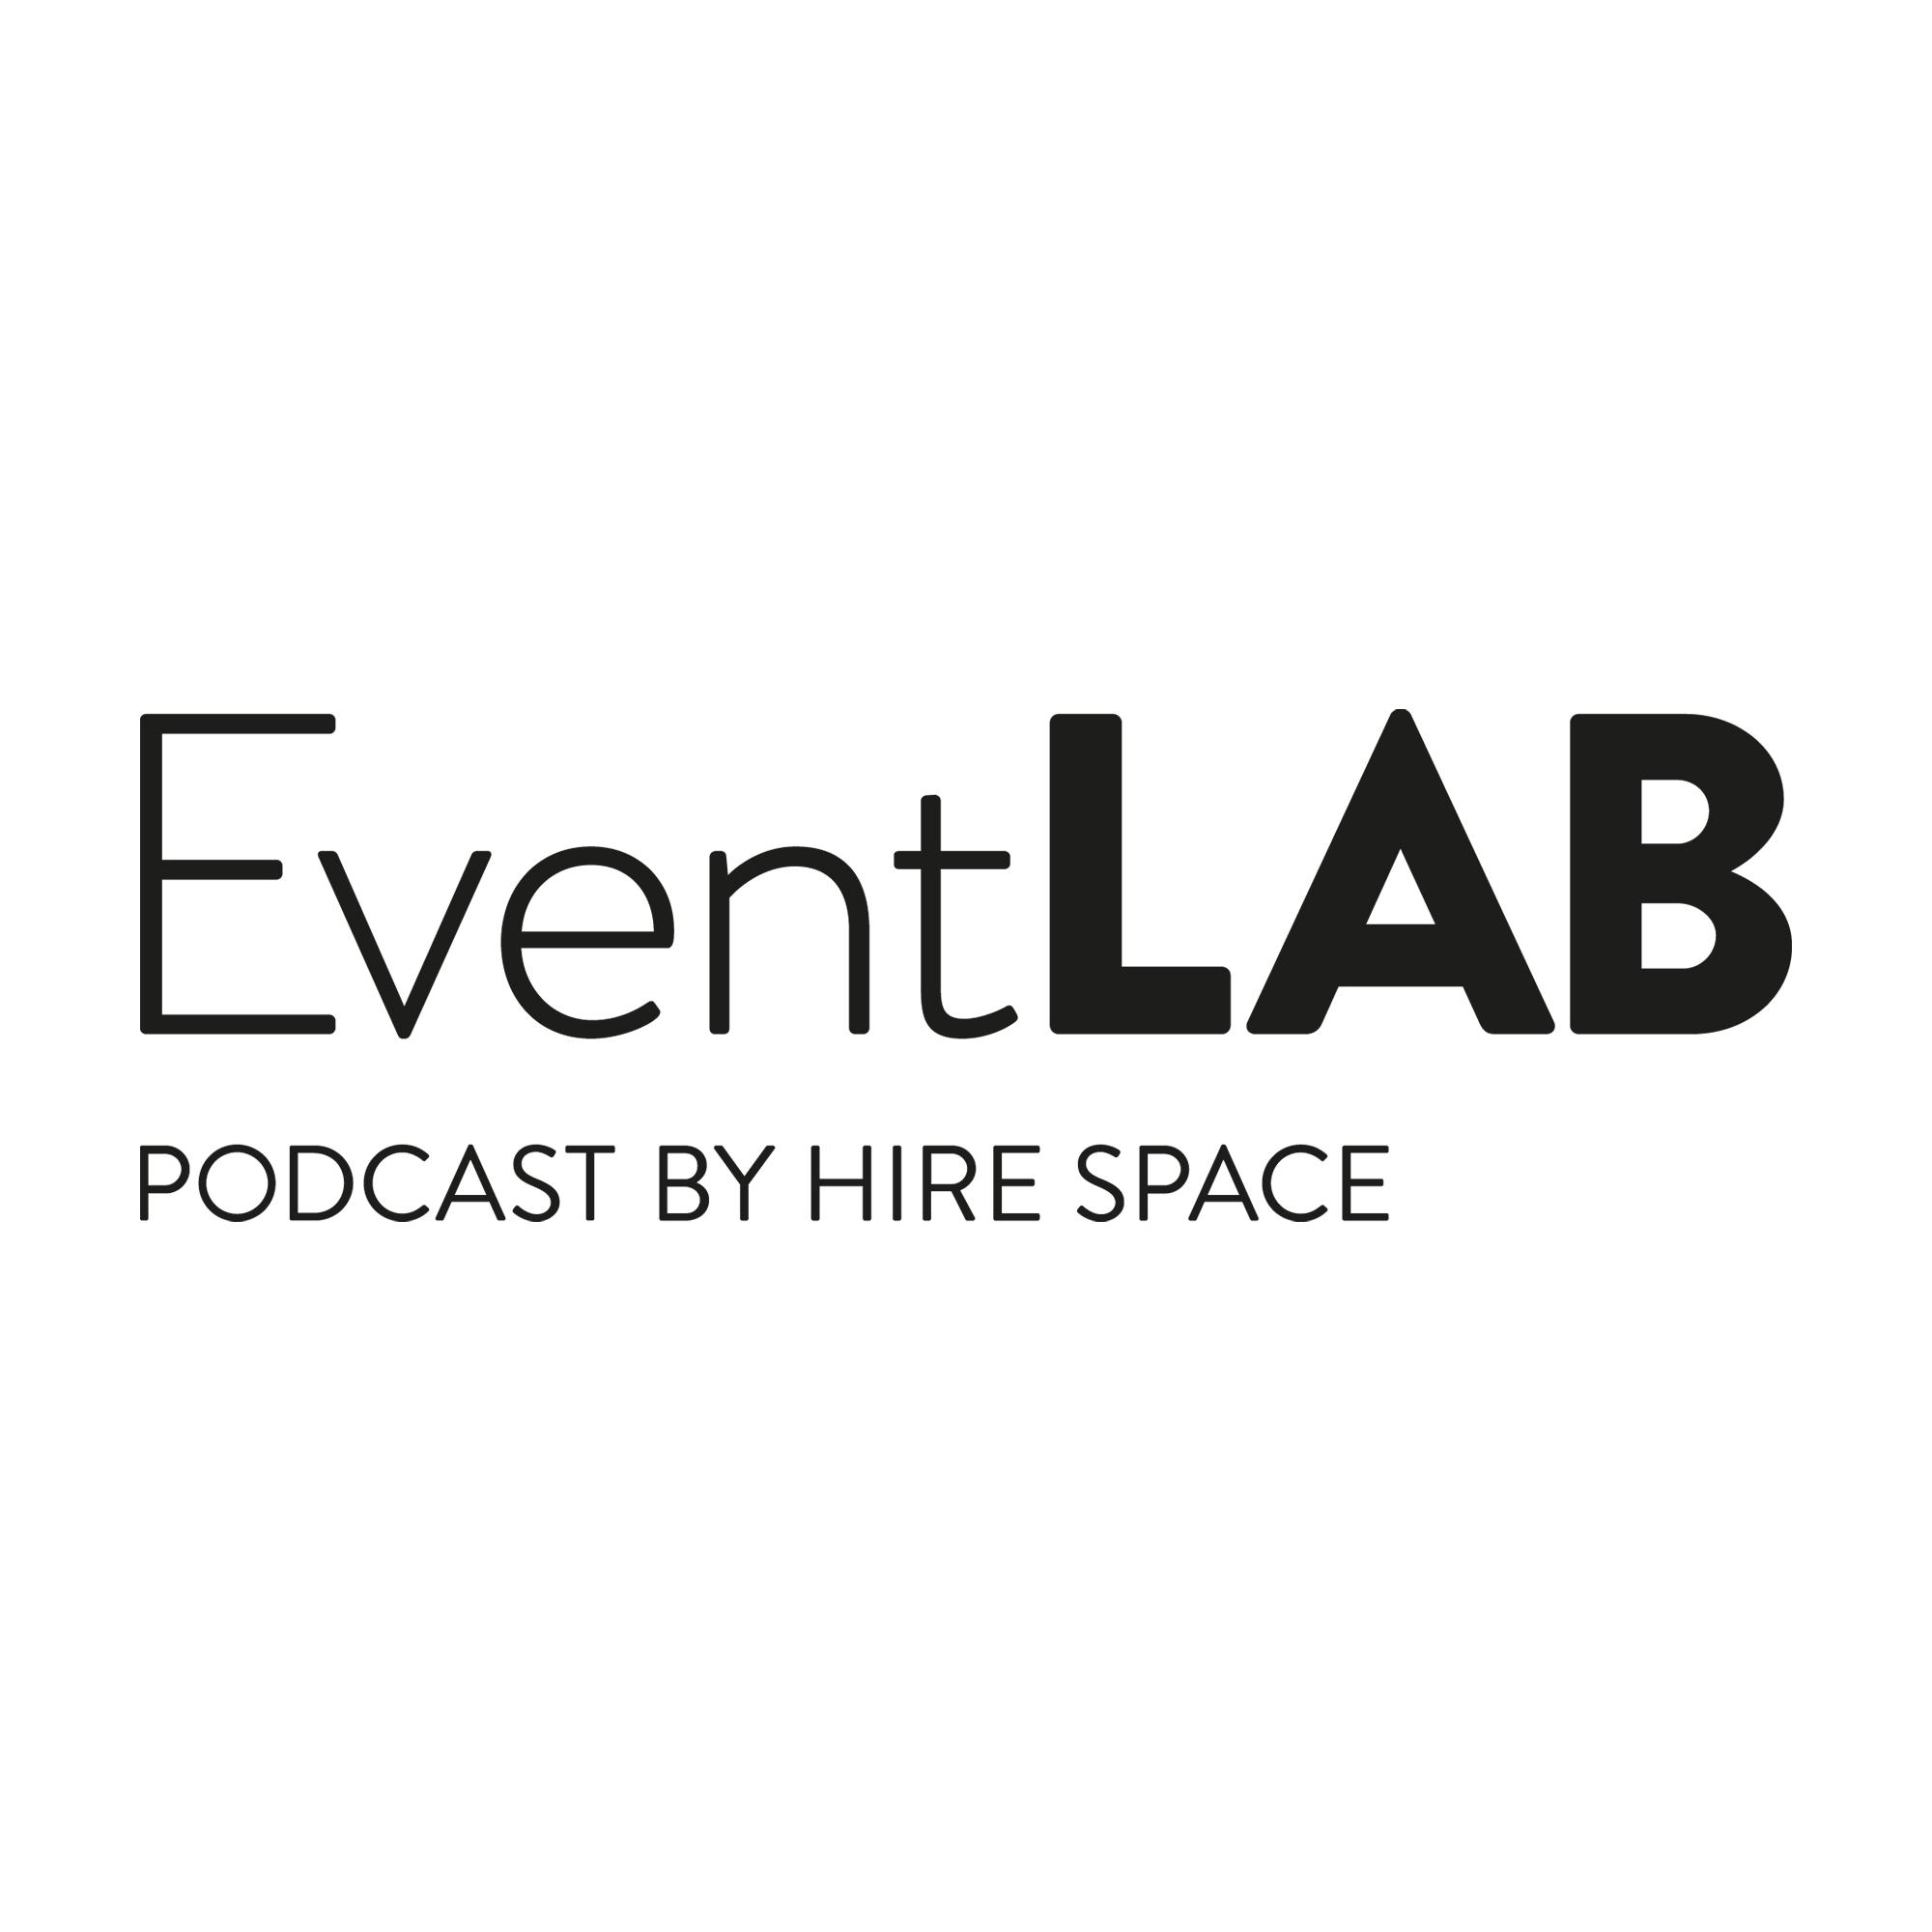 EventLAB_Podcast_Logo_2000x2000.jpg